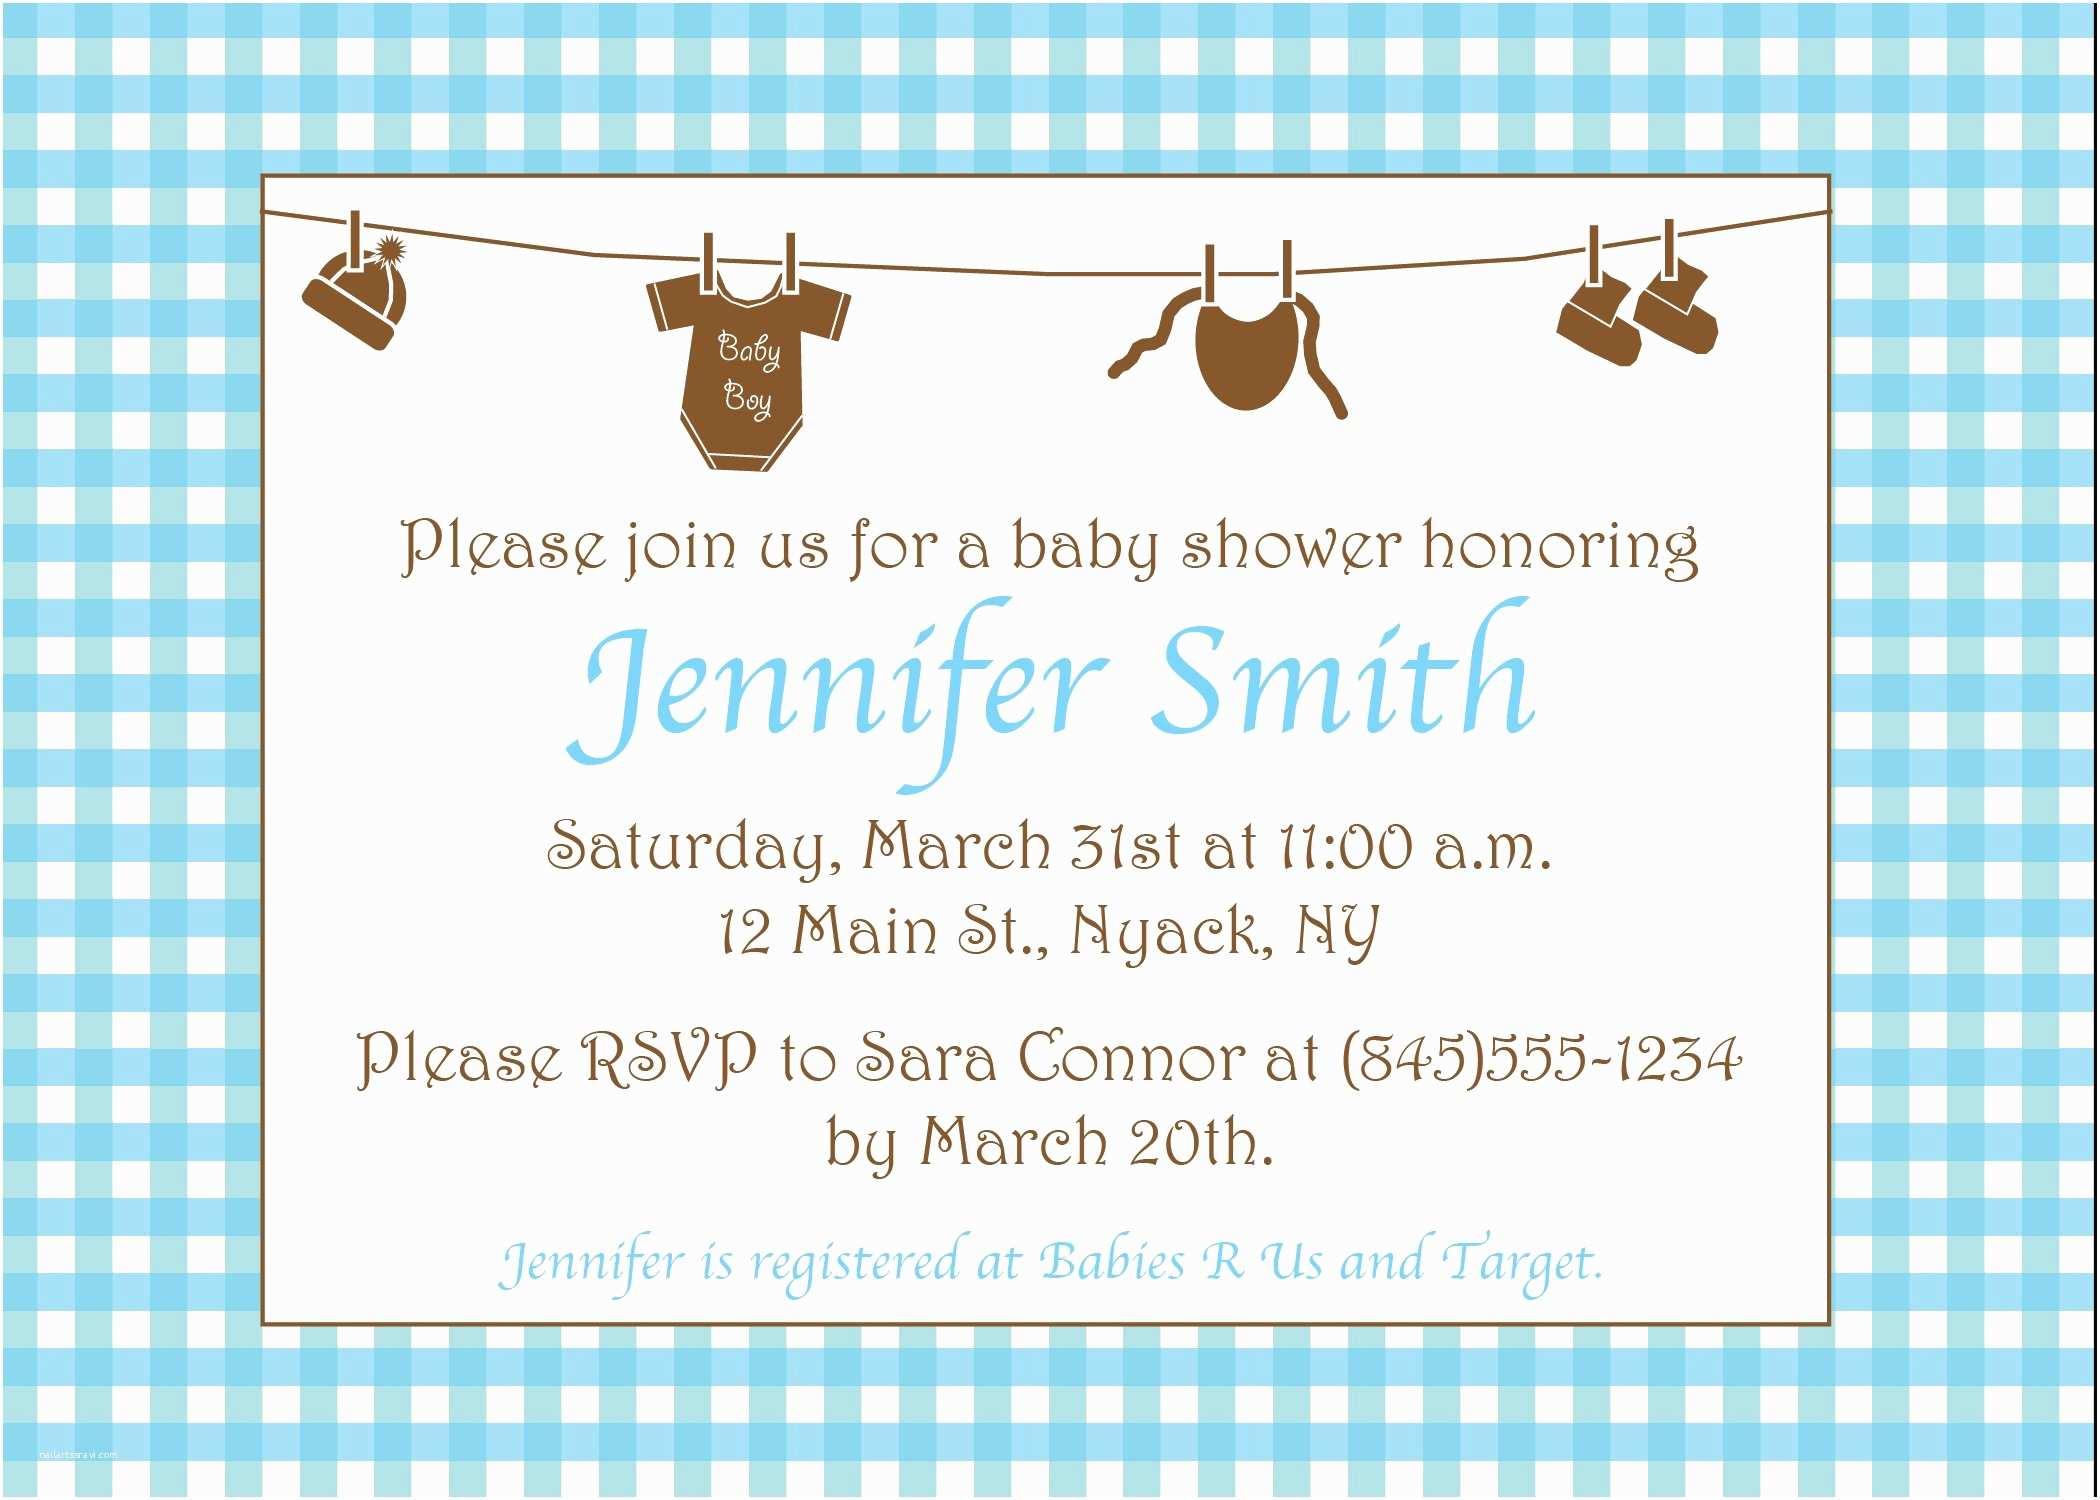 Baby Shower Invitation Message Birthday Invitation Mickey Mouse Birthday Invitations